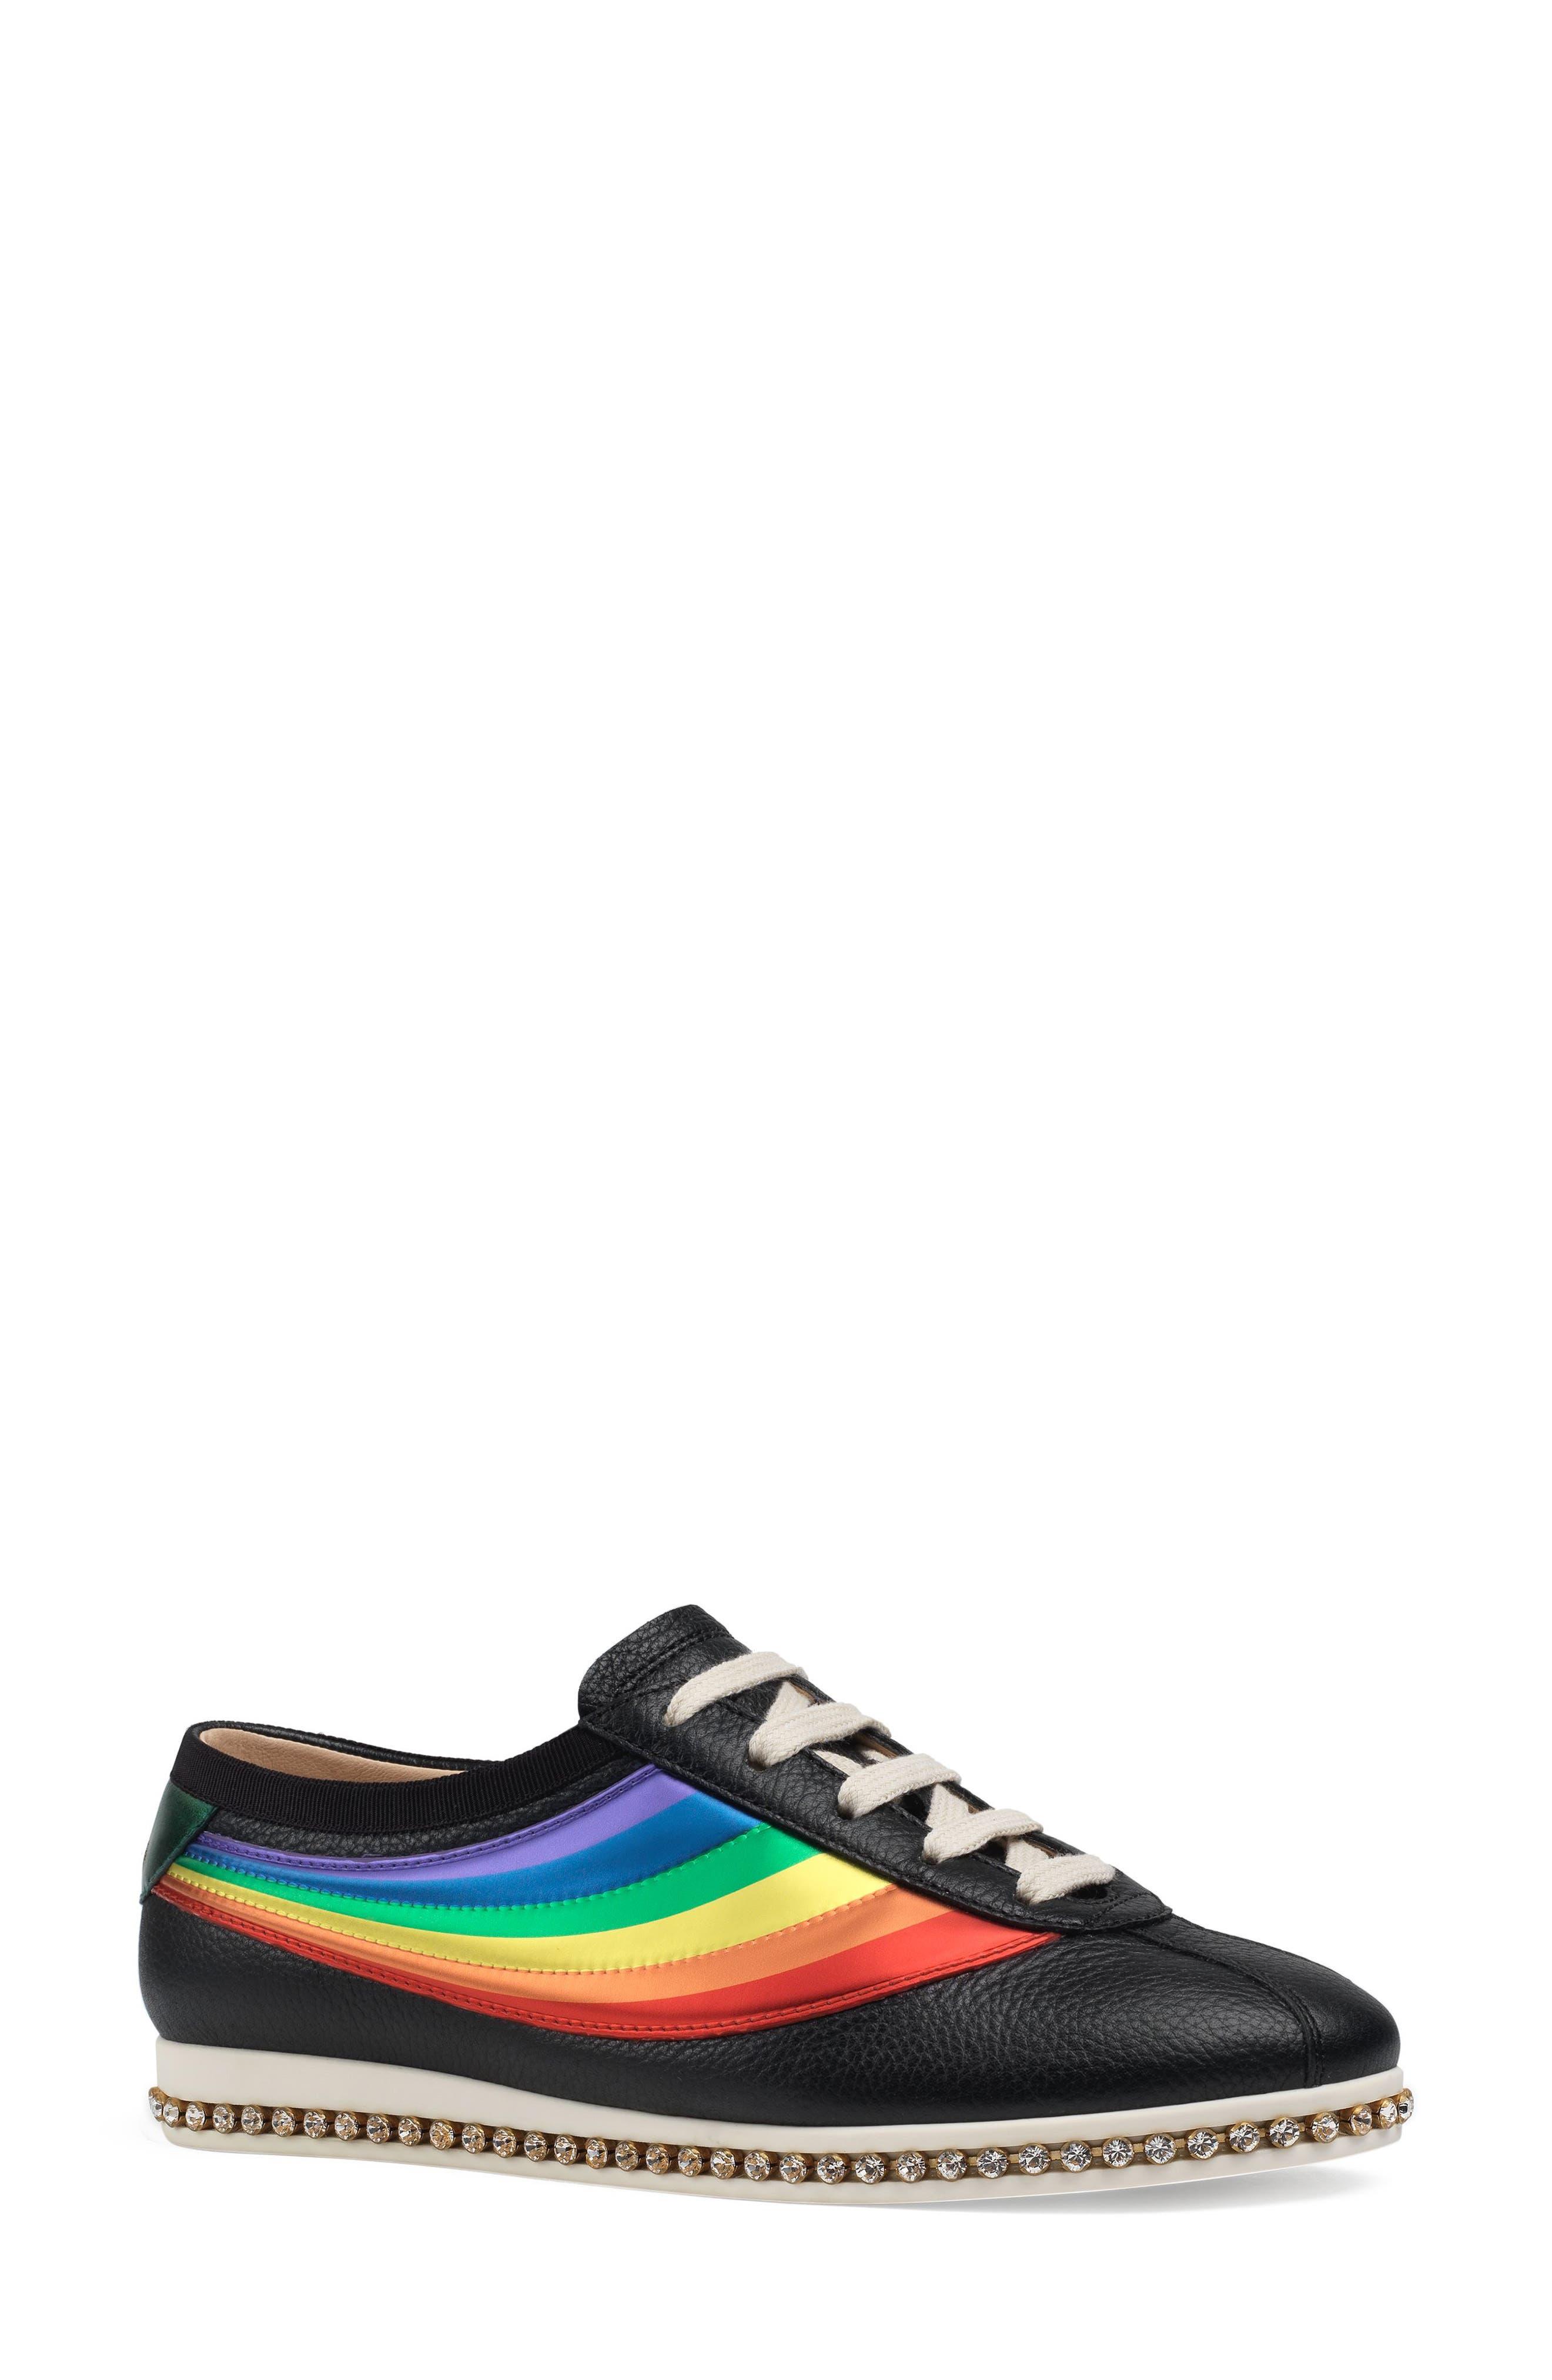 Falacer Sneaker,                             Main thumbnail 1, color,                             BLACK